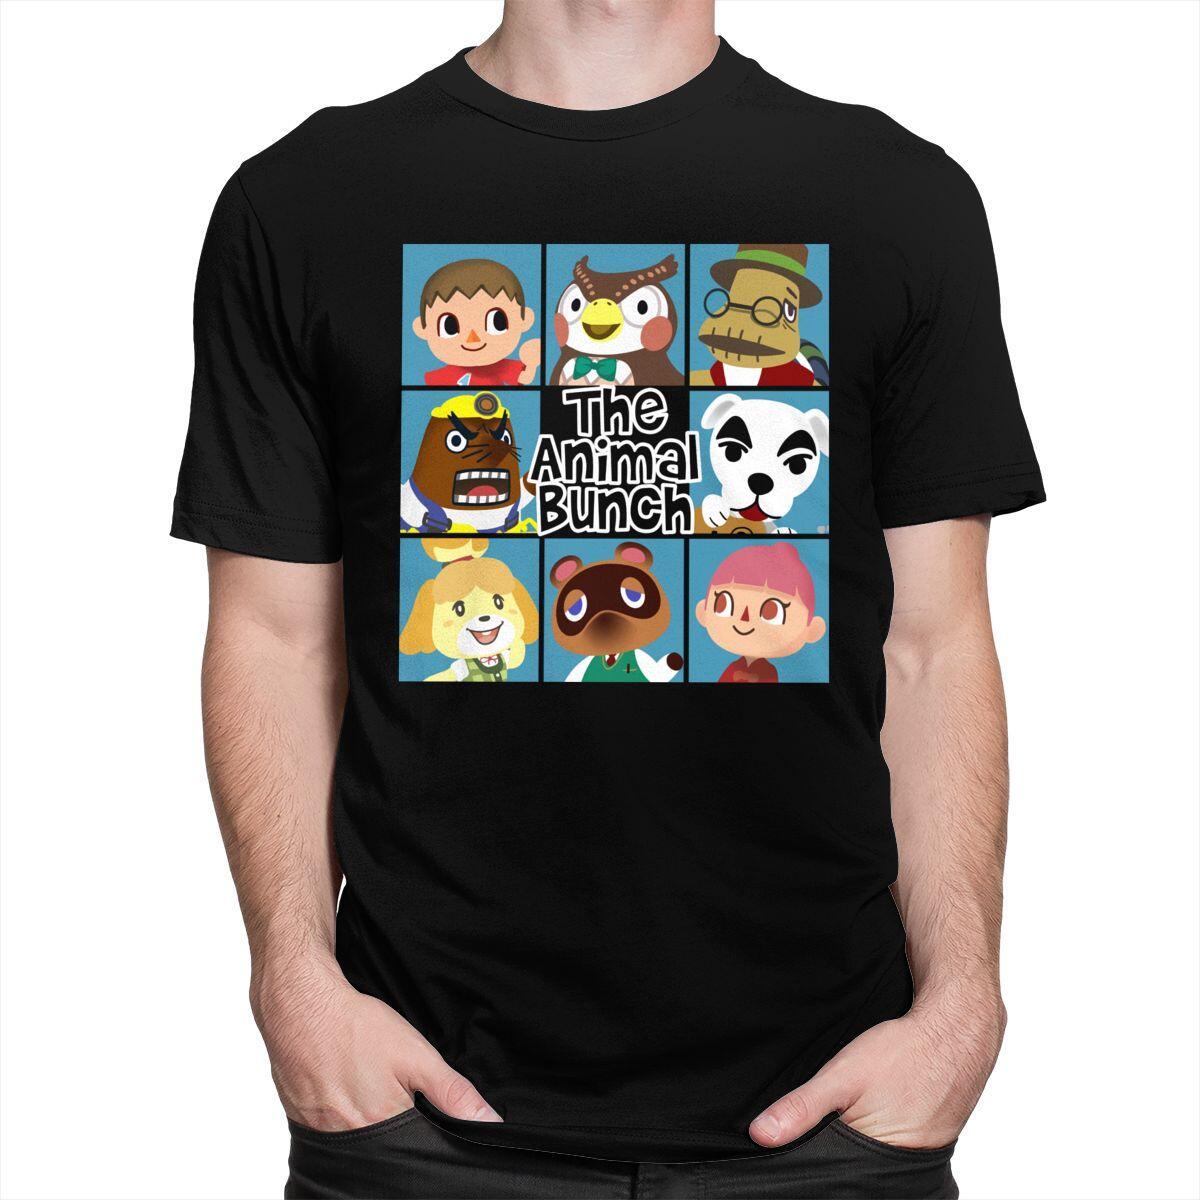 Animal Crossing Brady Bunch Style Shirt, Black / S